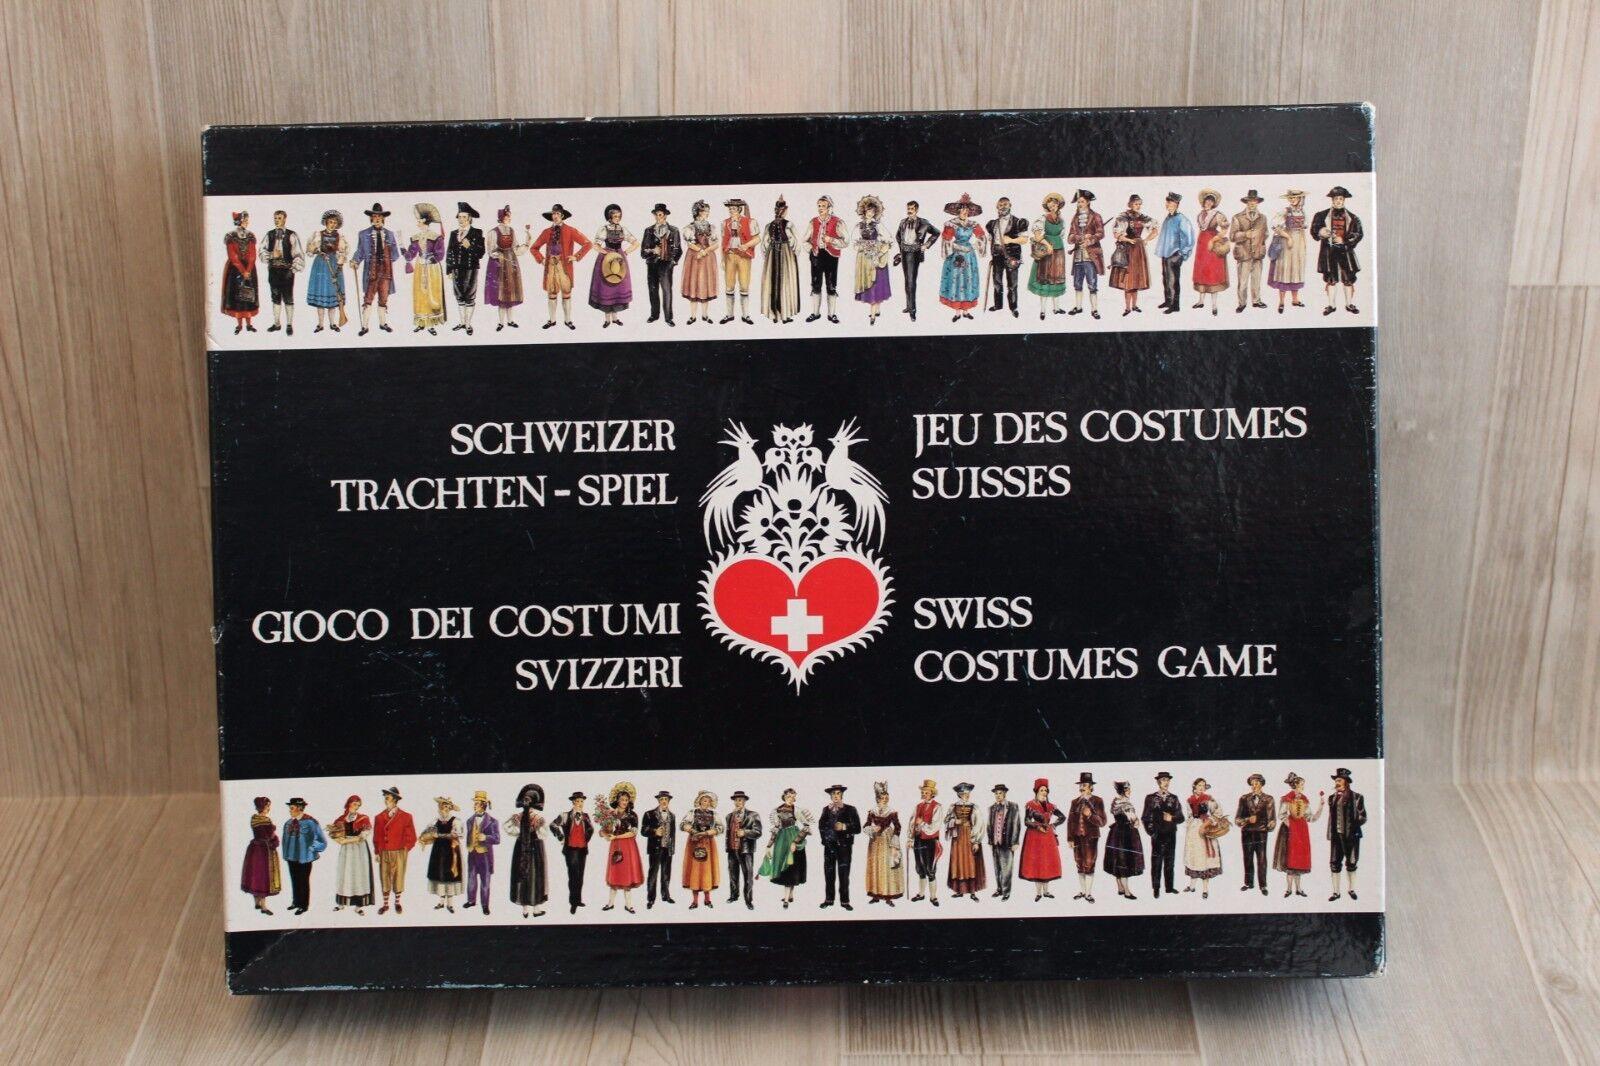 Rare   Jeu des Costumes Suisses - Swiss Costumes Game - Schweizer Trachten